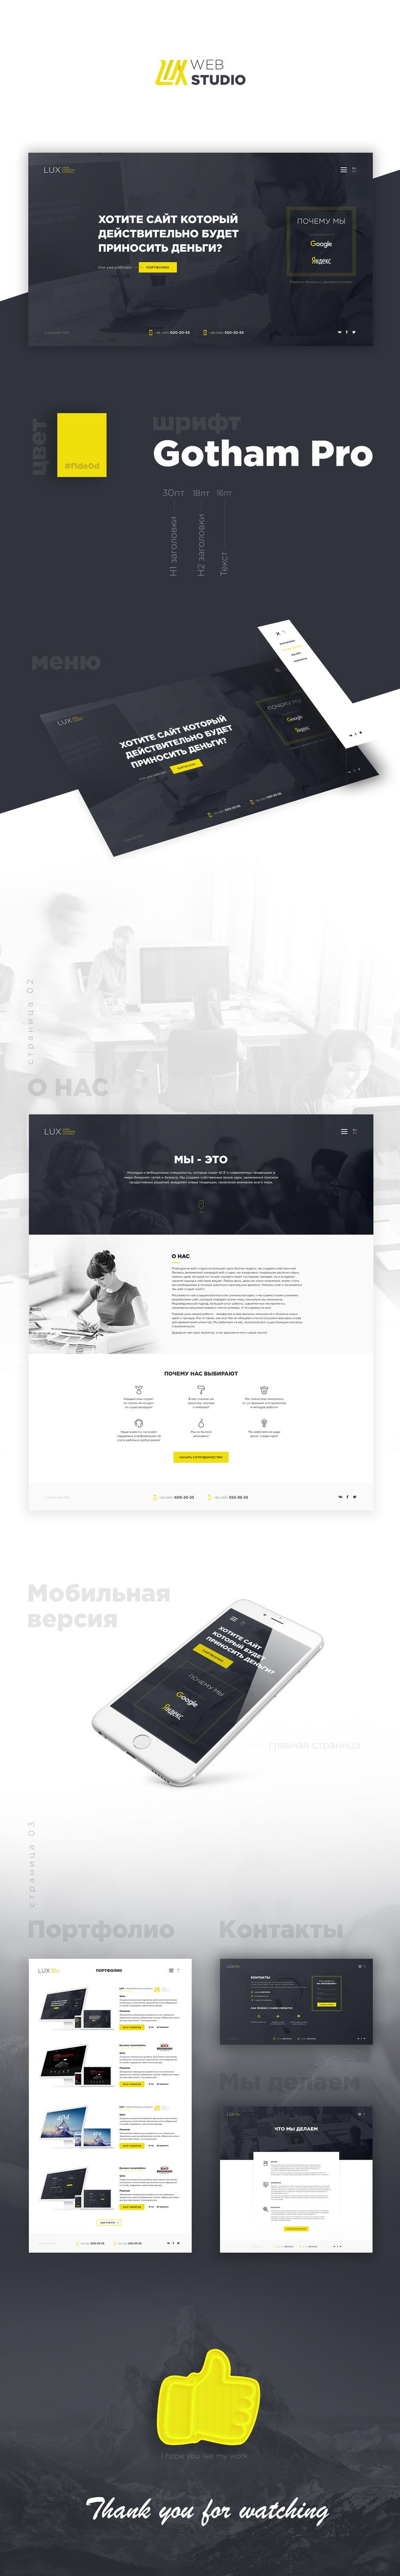 "Consulta este proyecto @Behance: ""LUX web studio"" https://www.behance.net/gallery/42572699/LUX-web-studio"